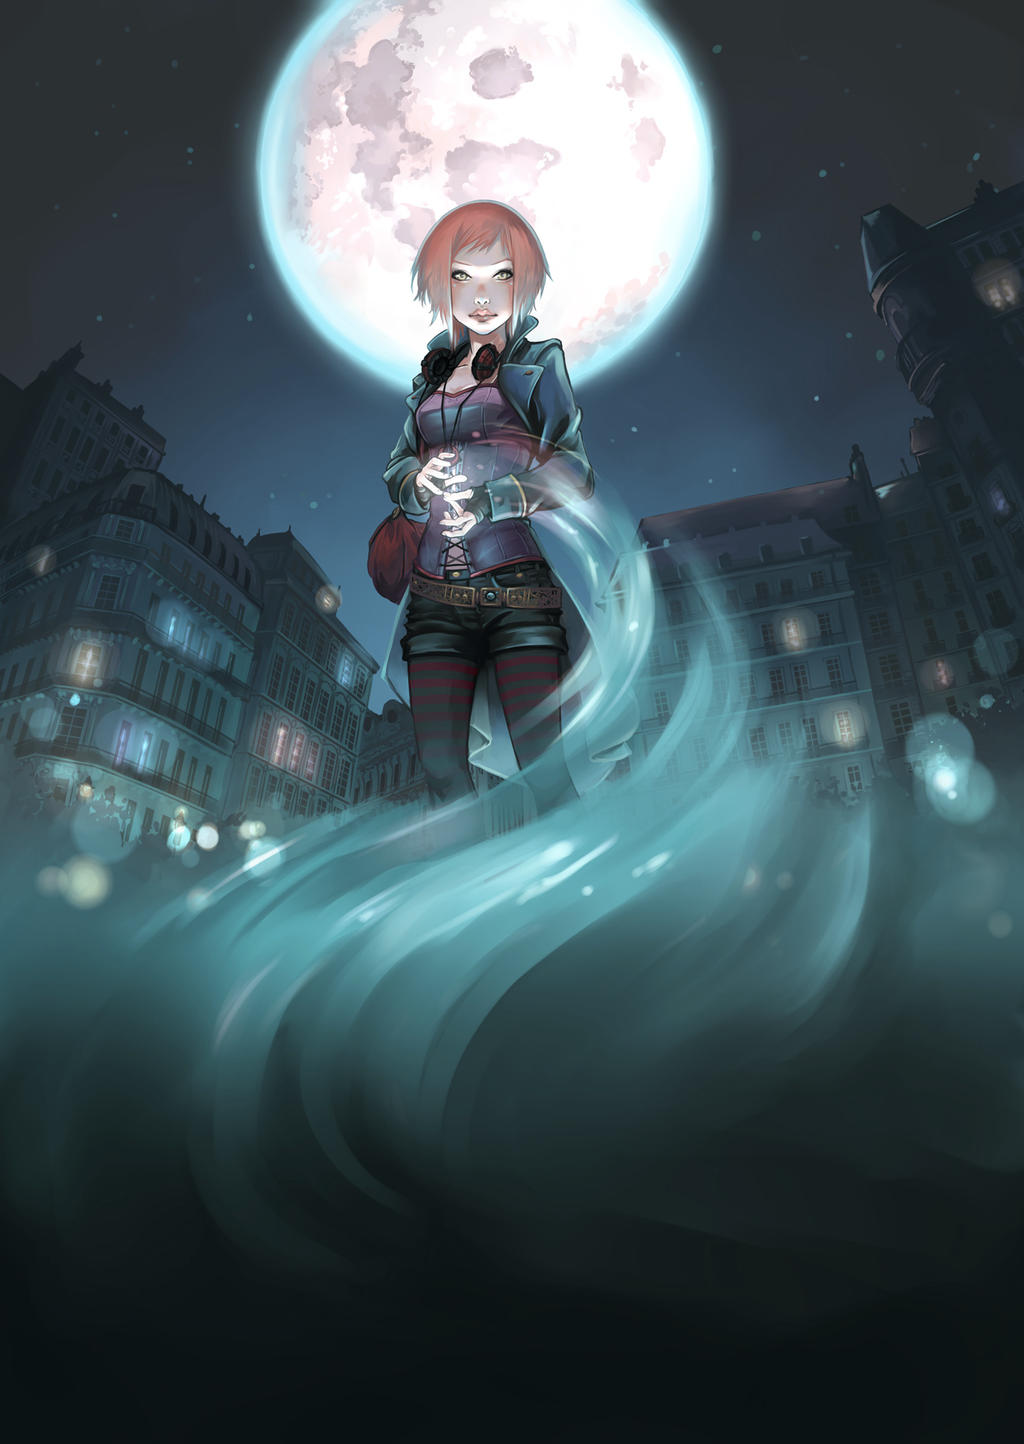 Magik alternative cover by Krystel-art